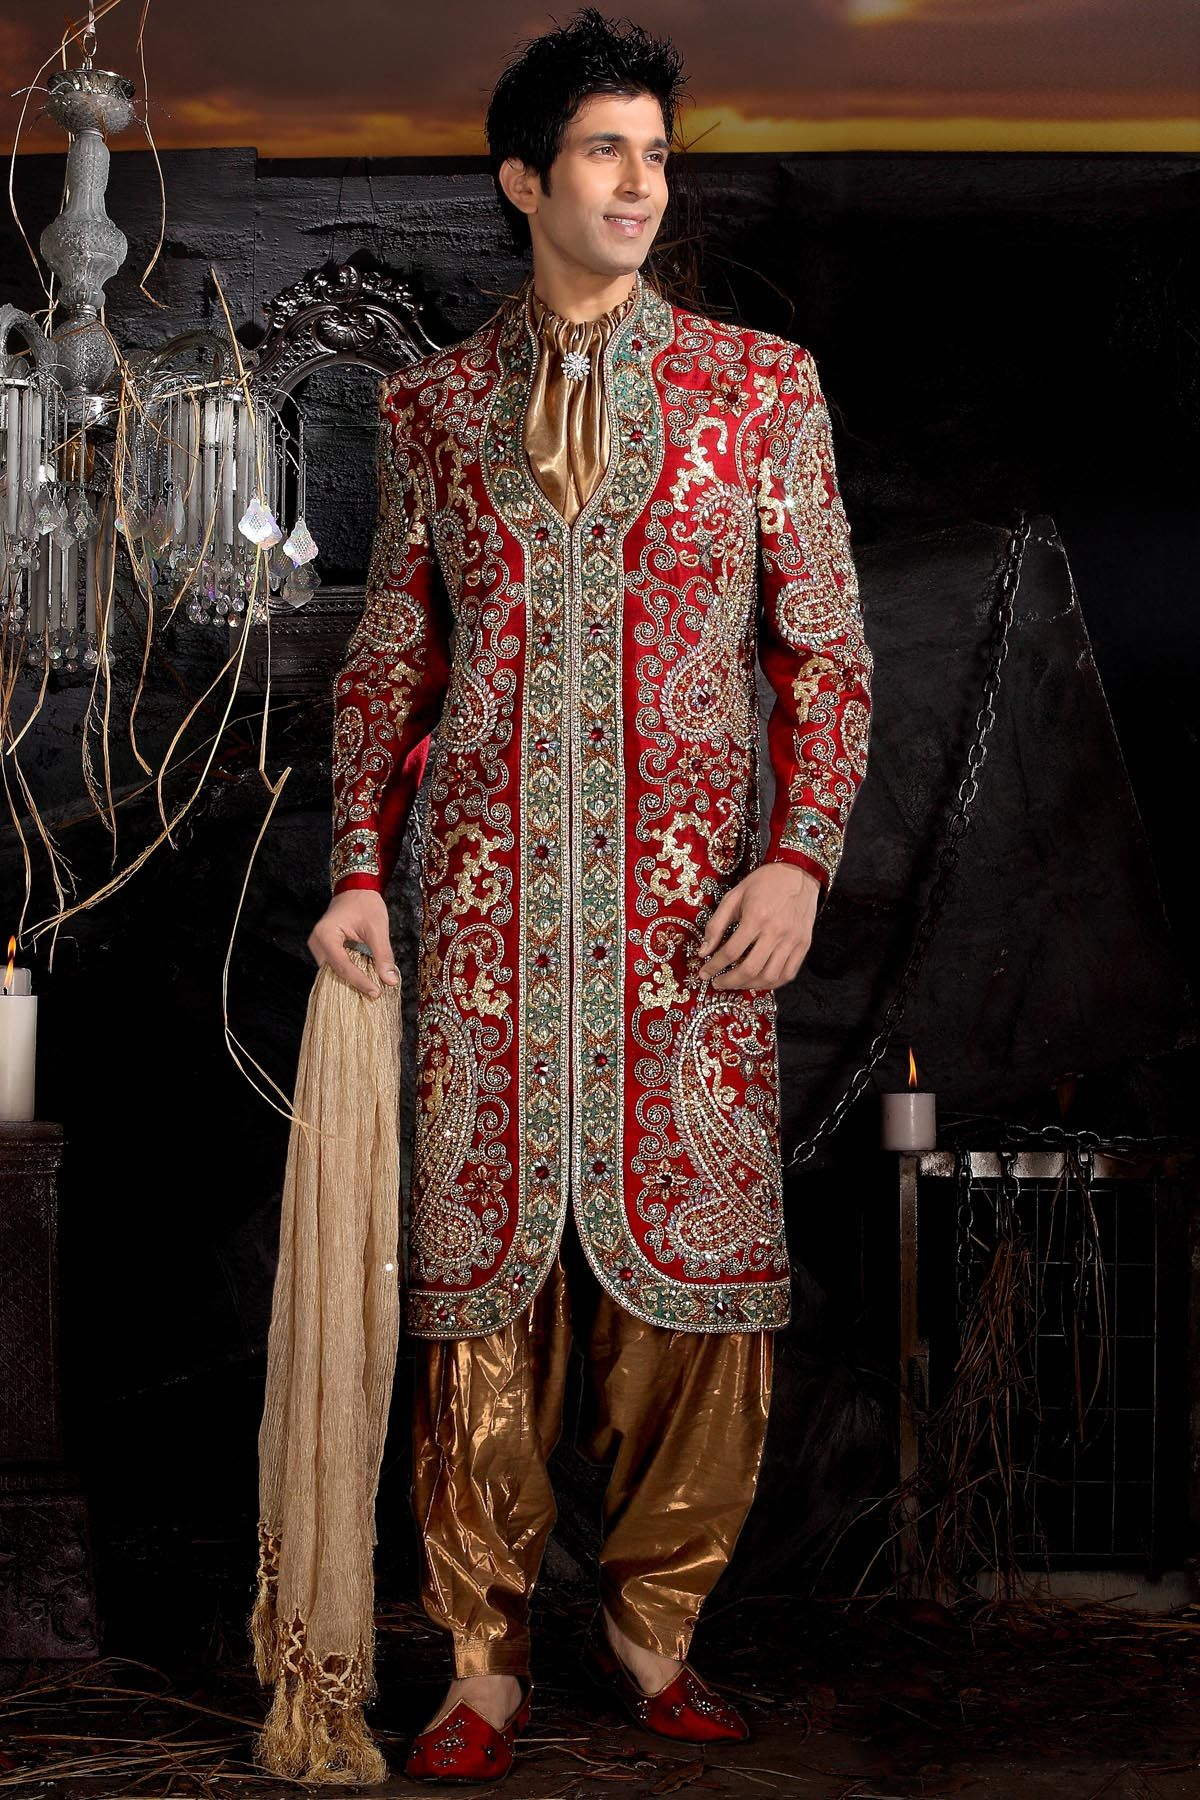 Groom wedding sherwani dresses design 2014 | wedding | Pinterest ...